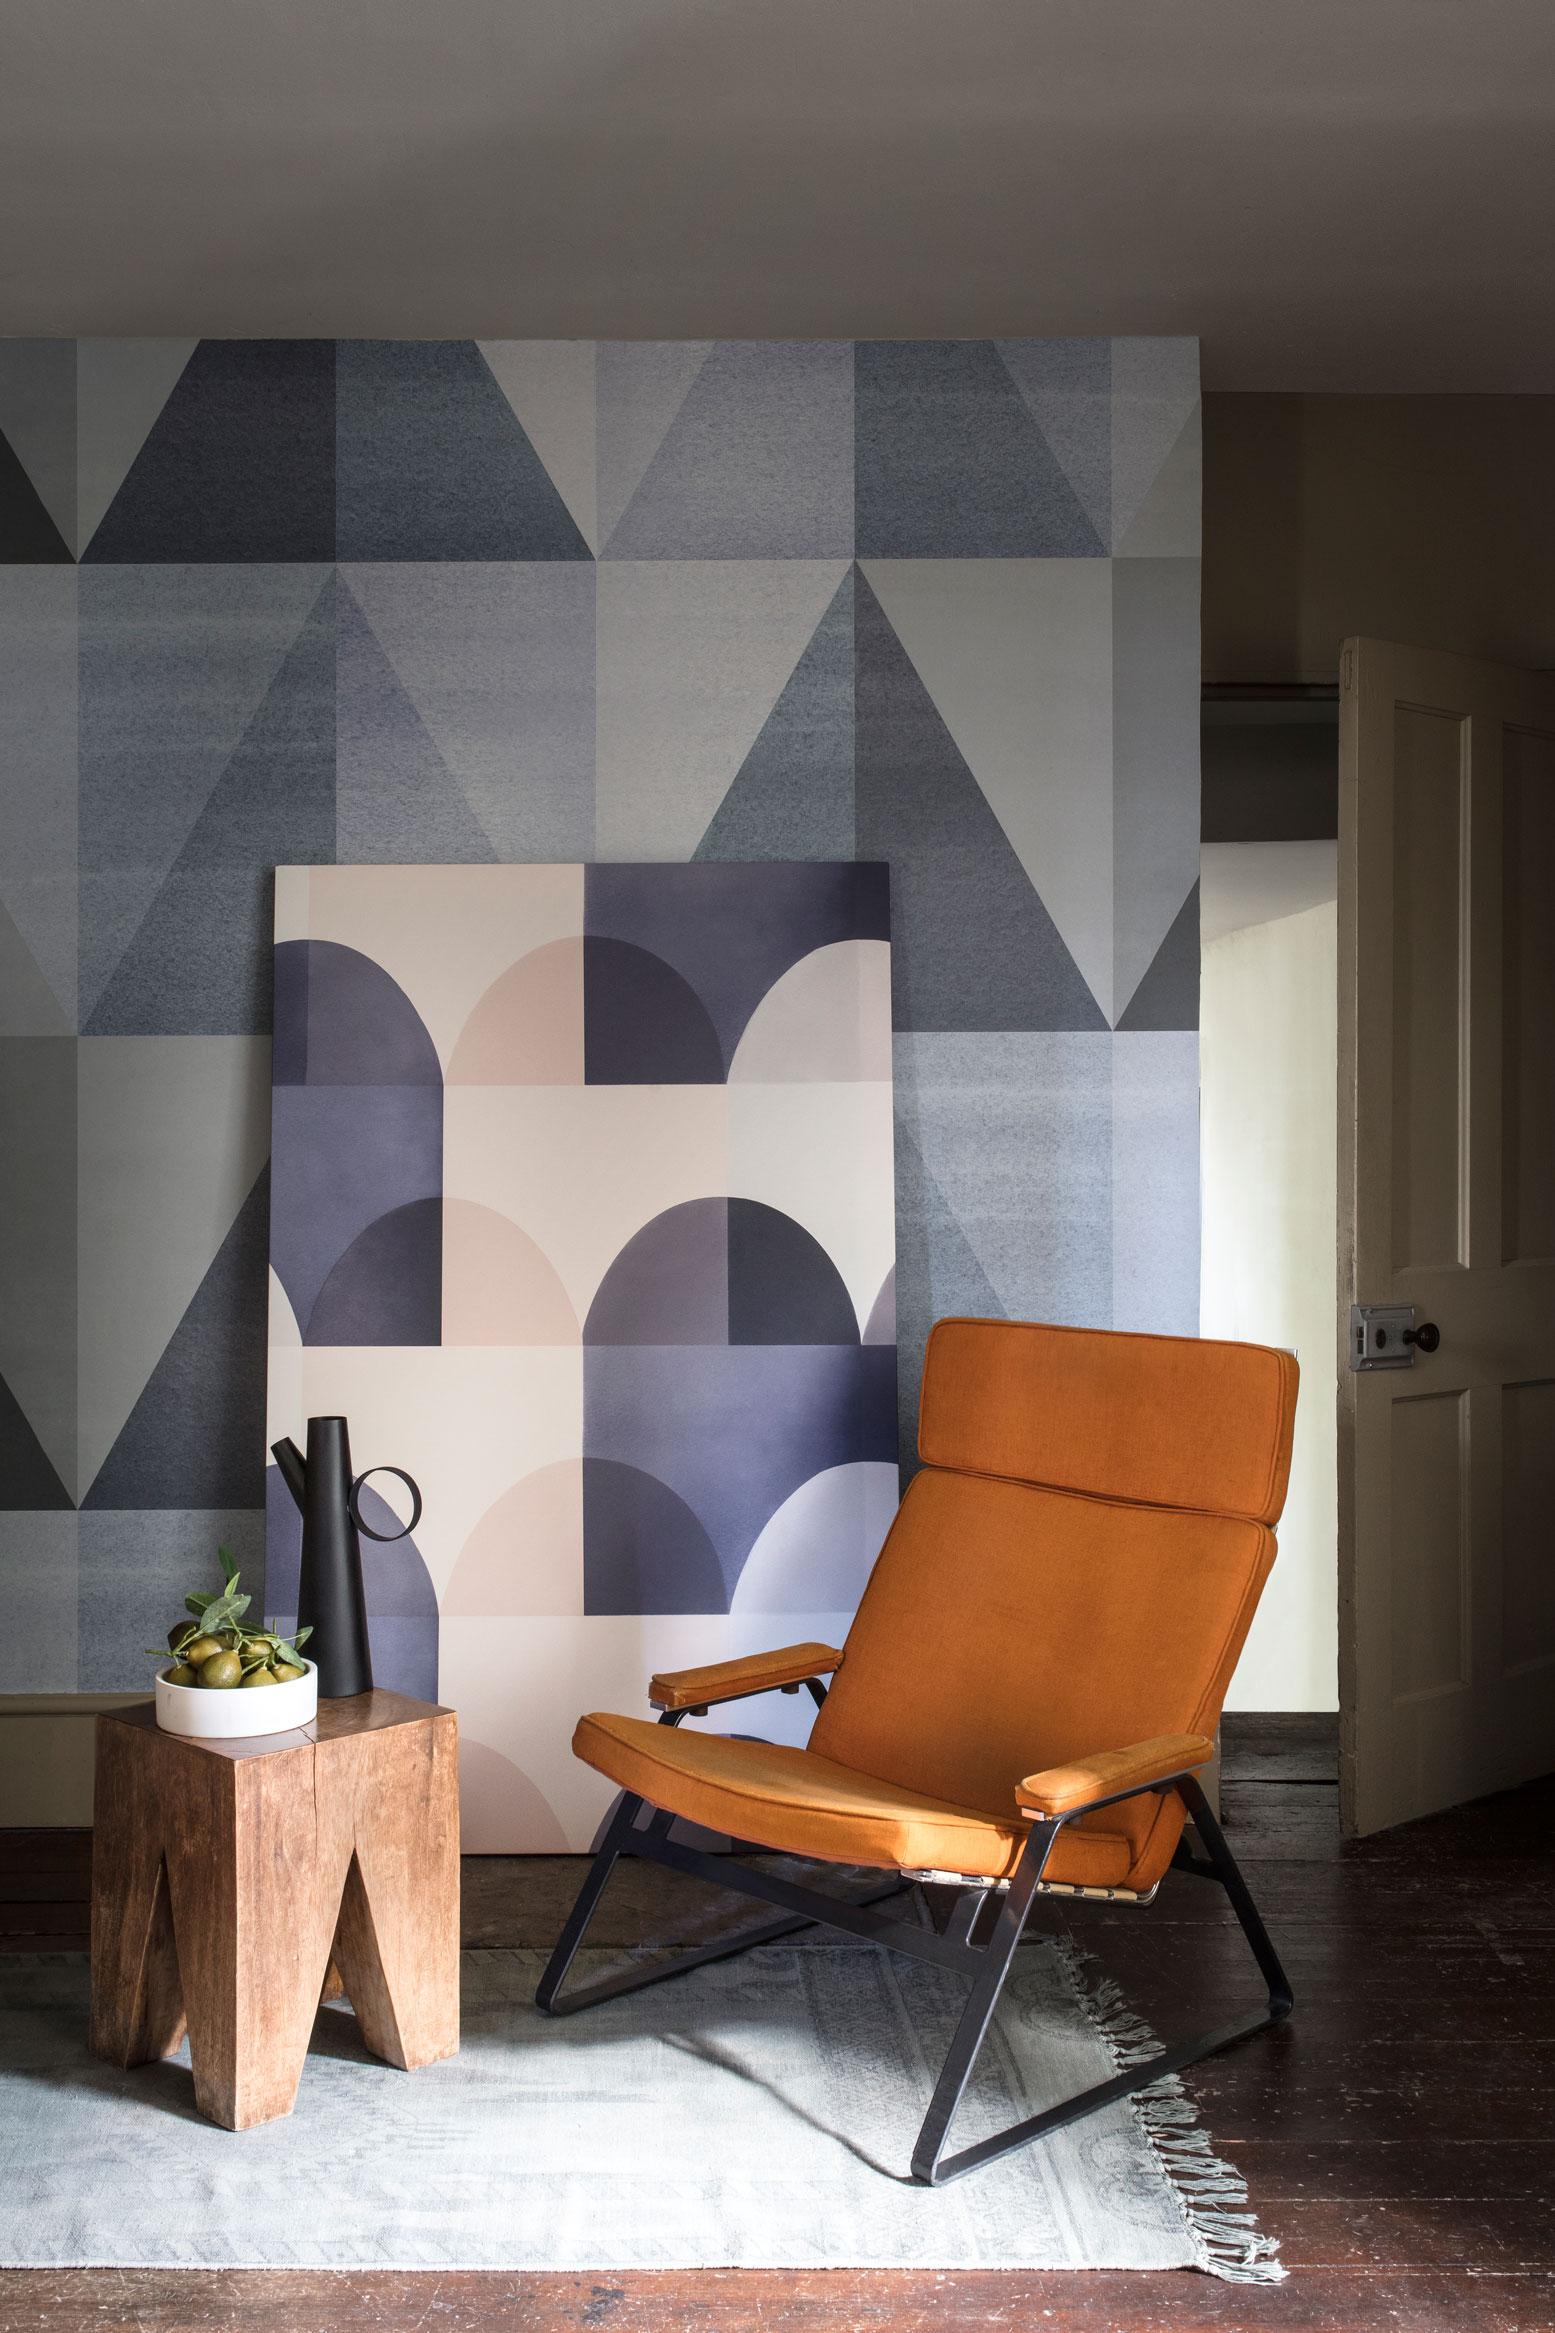 ImogenHeath_Viaduct&Mera_Wallpaper.jpg